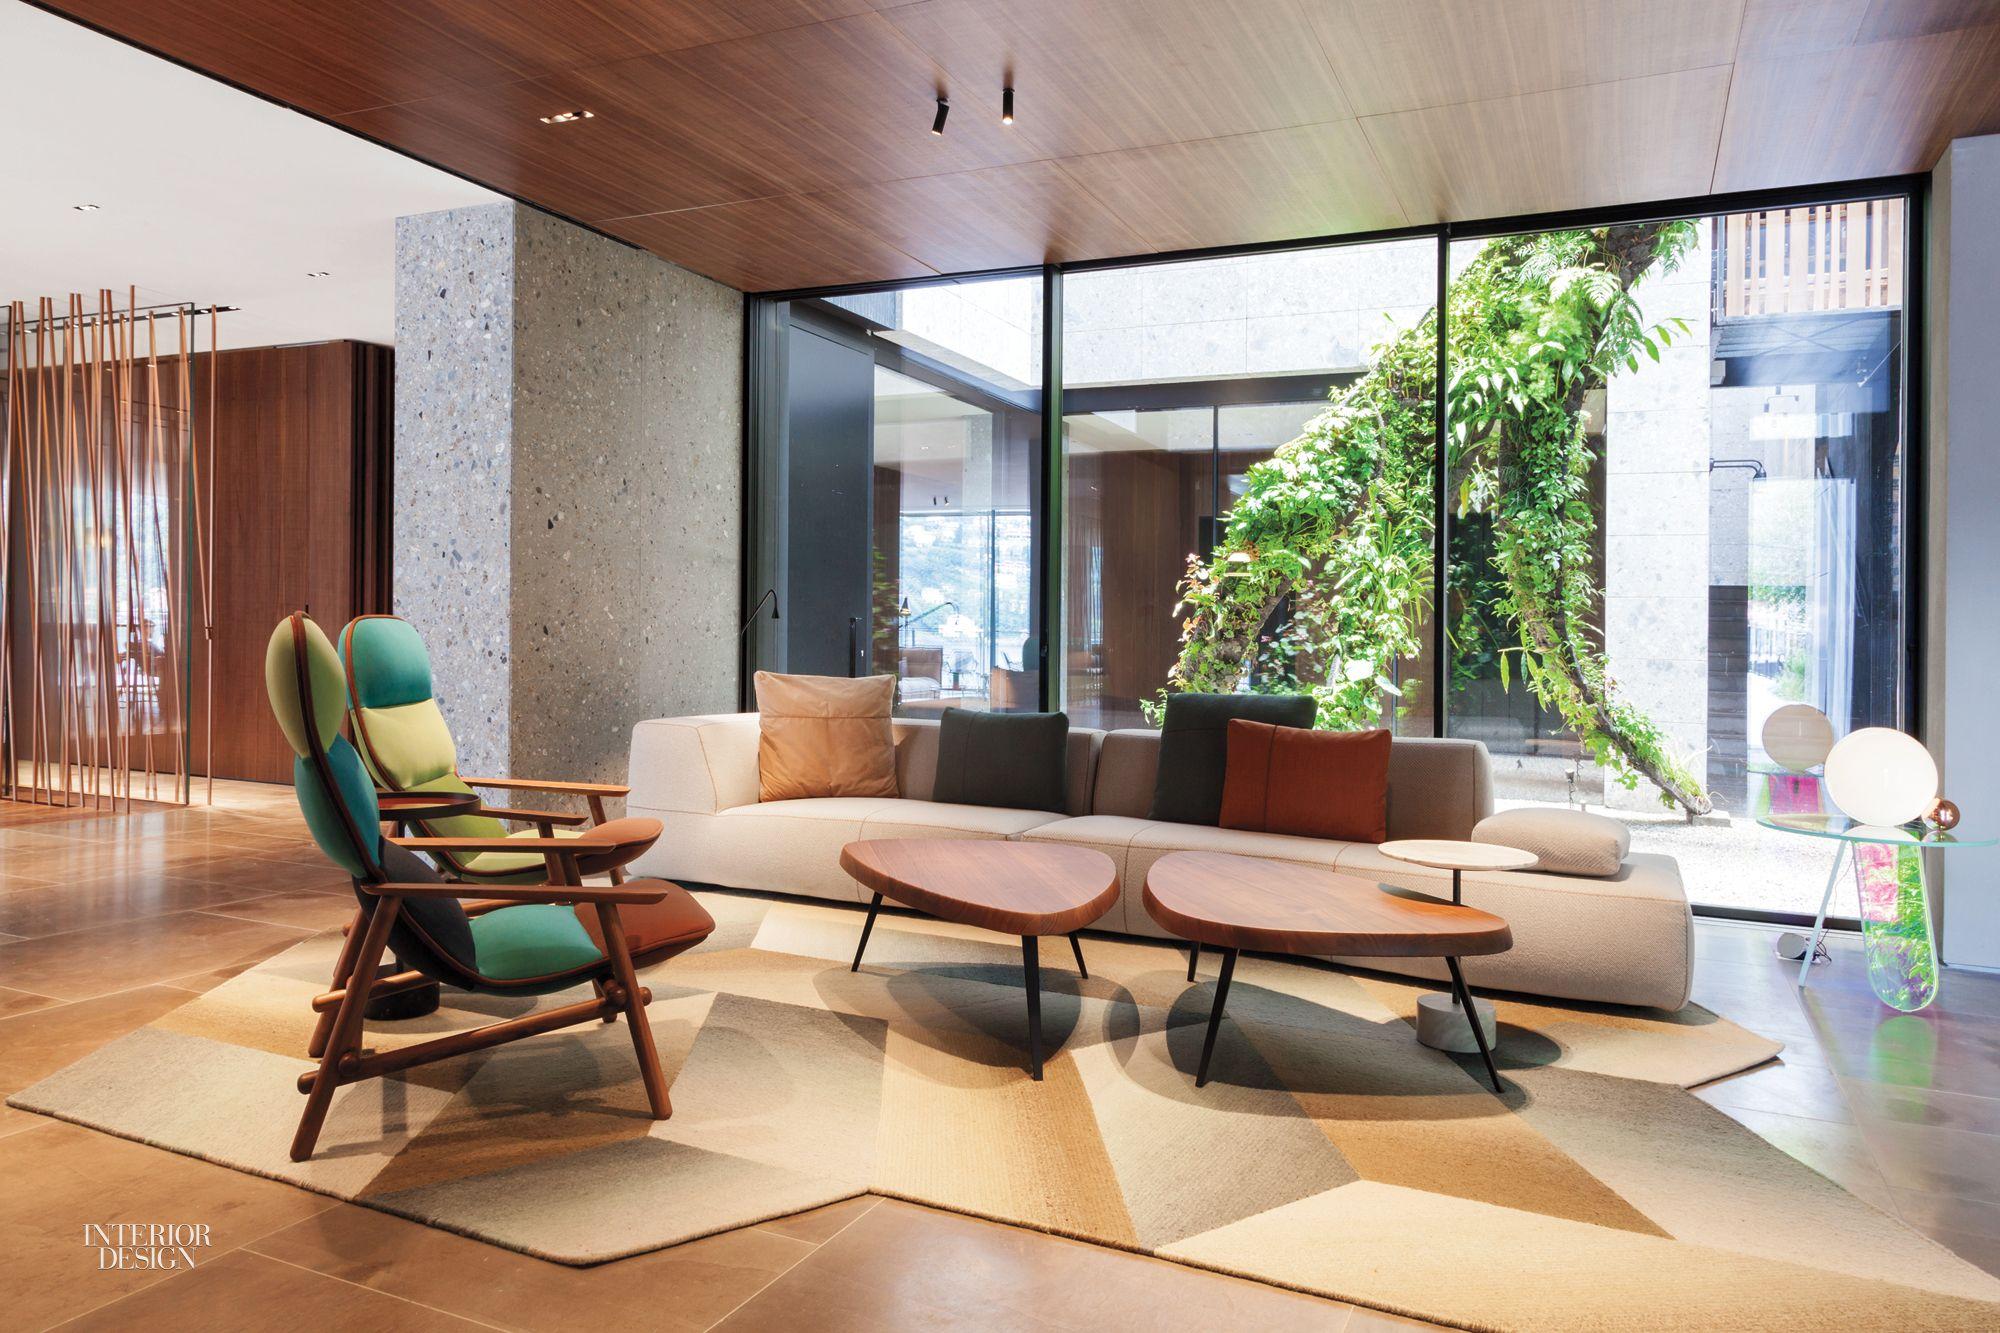 patricia urquiola designs idyllic lake como hotel il sereno interiors hospitality retail. Black Bedroom Furniture Sets. Home Design Ideas